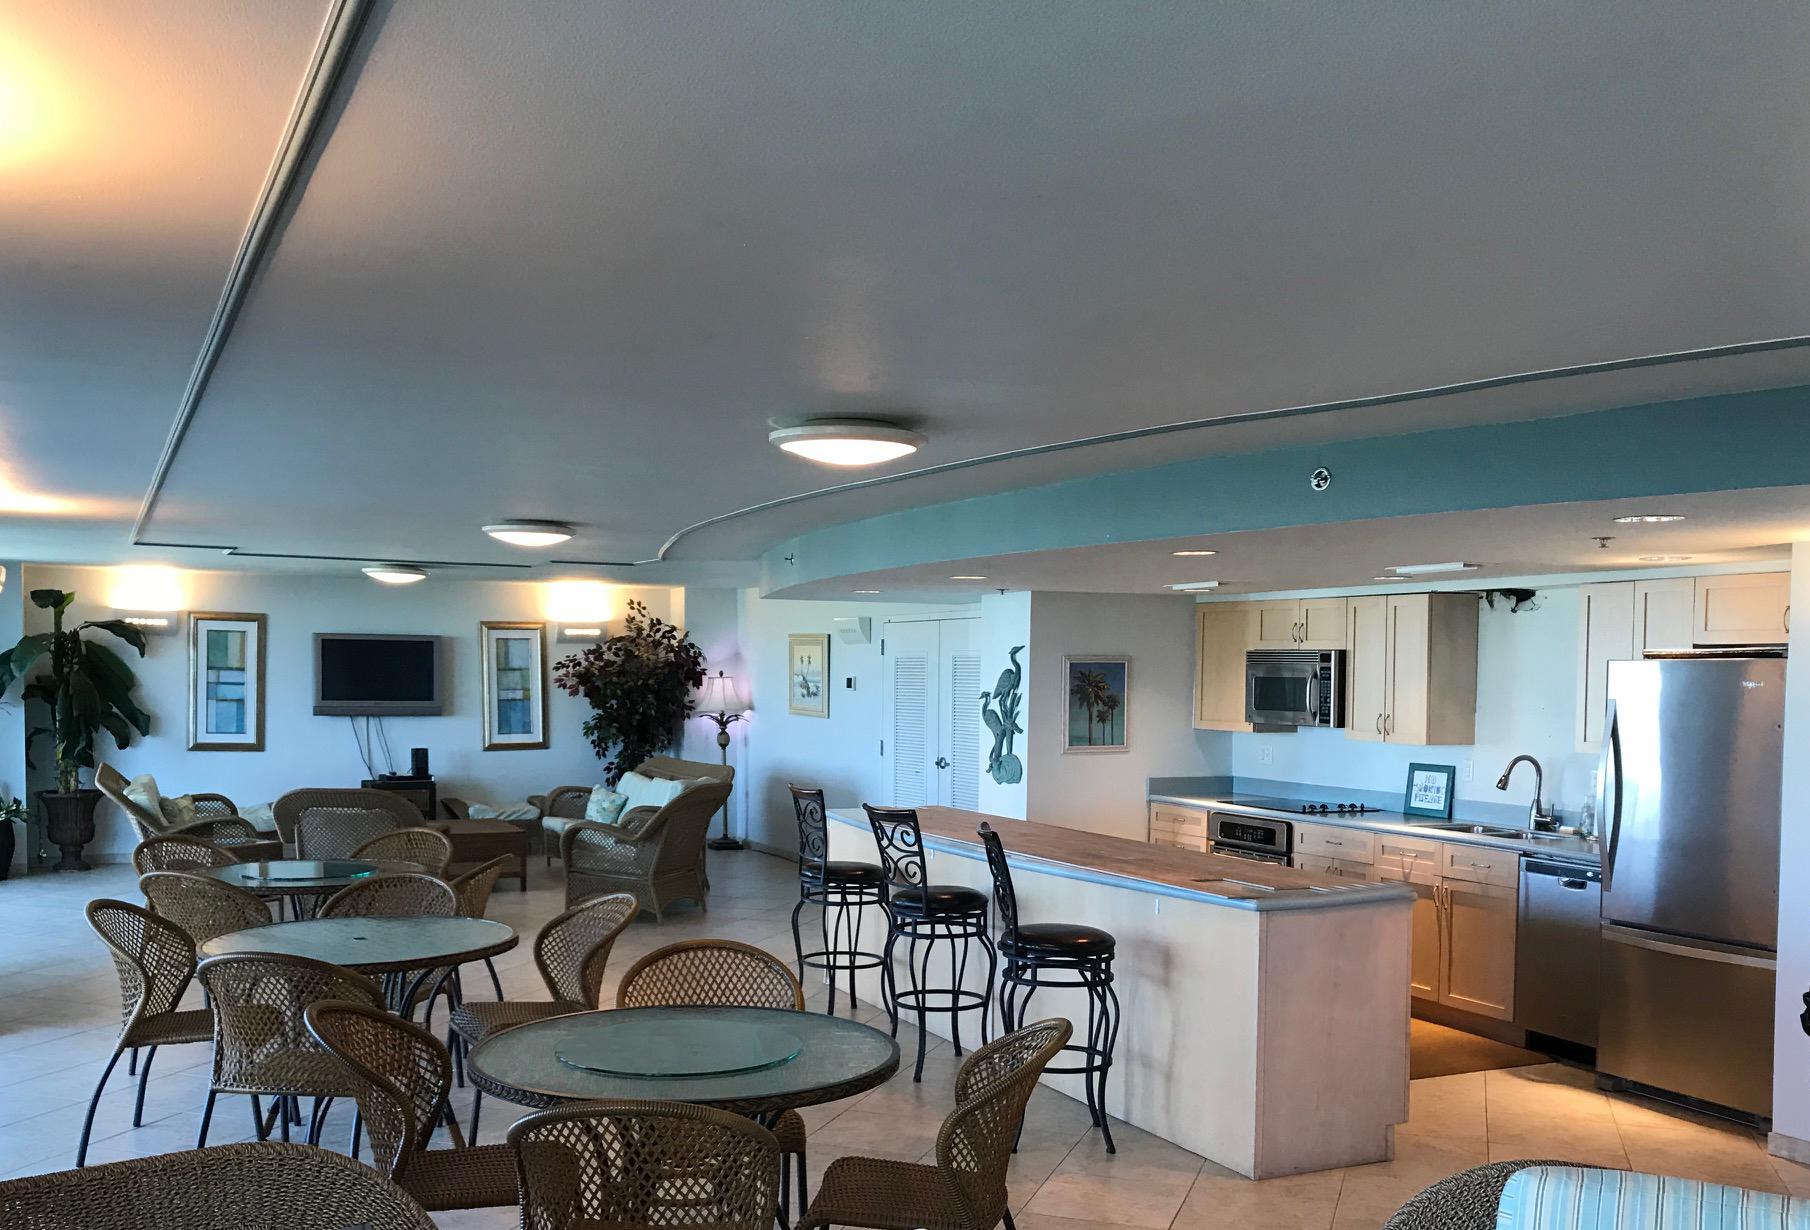 Sabine Yacht & Racquet Club #9D Condo rental in Sabine Yacht & Racquet Club ~ Pensacola Beach Condo Rentals by BeachGuide in Pensacola Beach Florida - #31